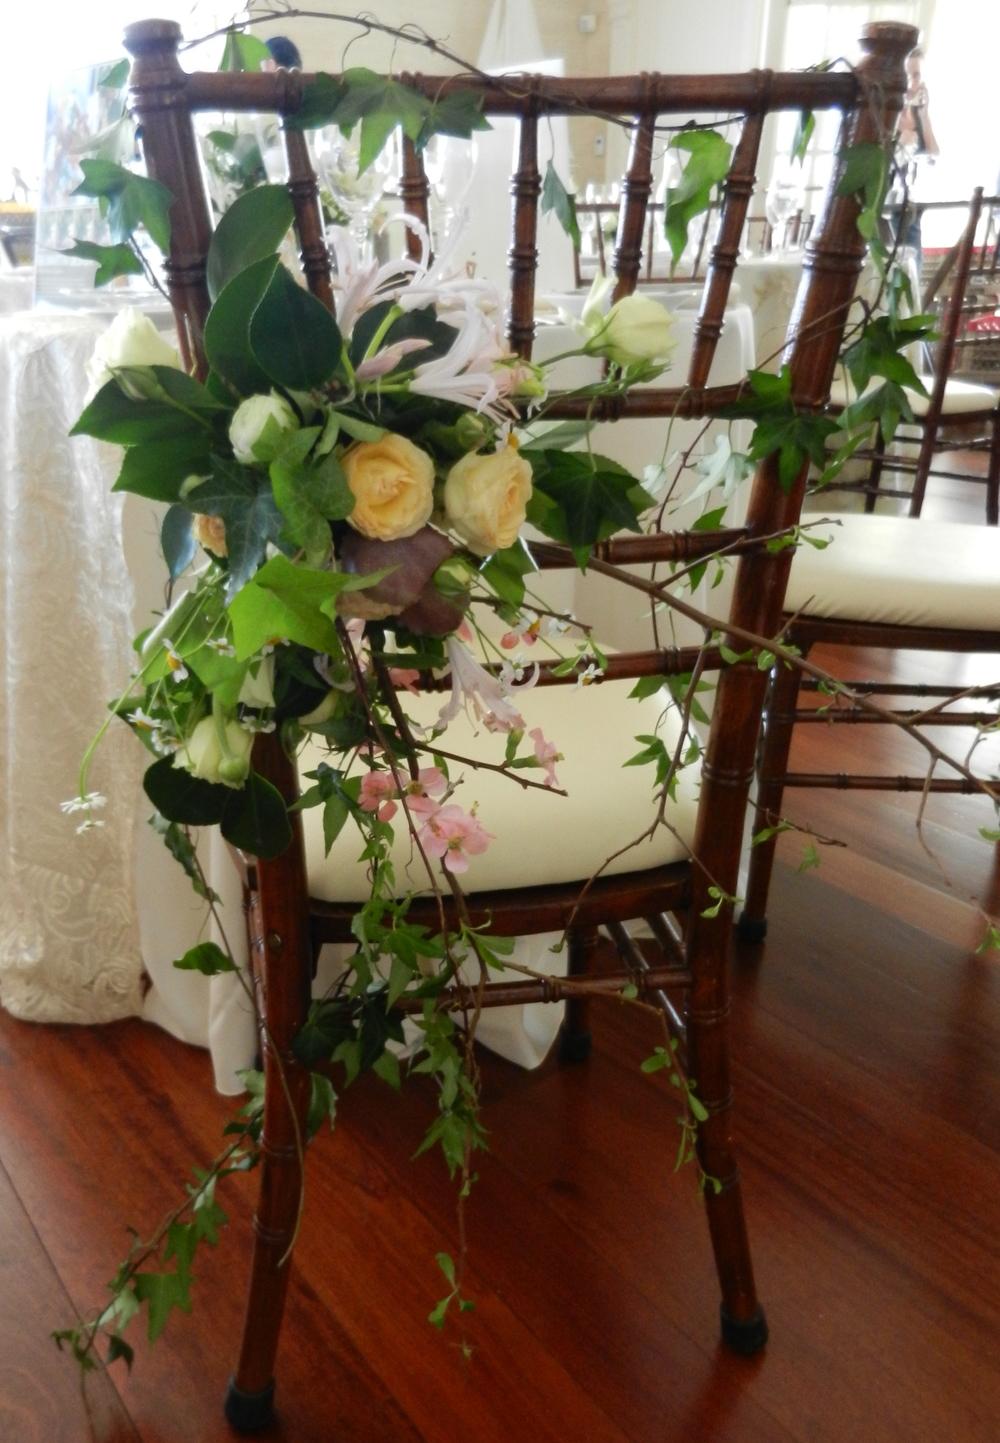 Chivari_chair flowers.jpeg